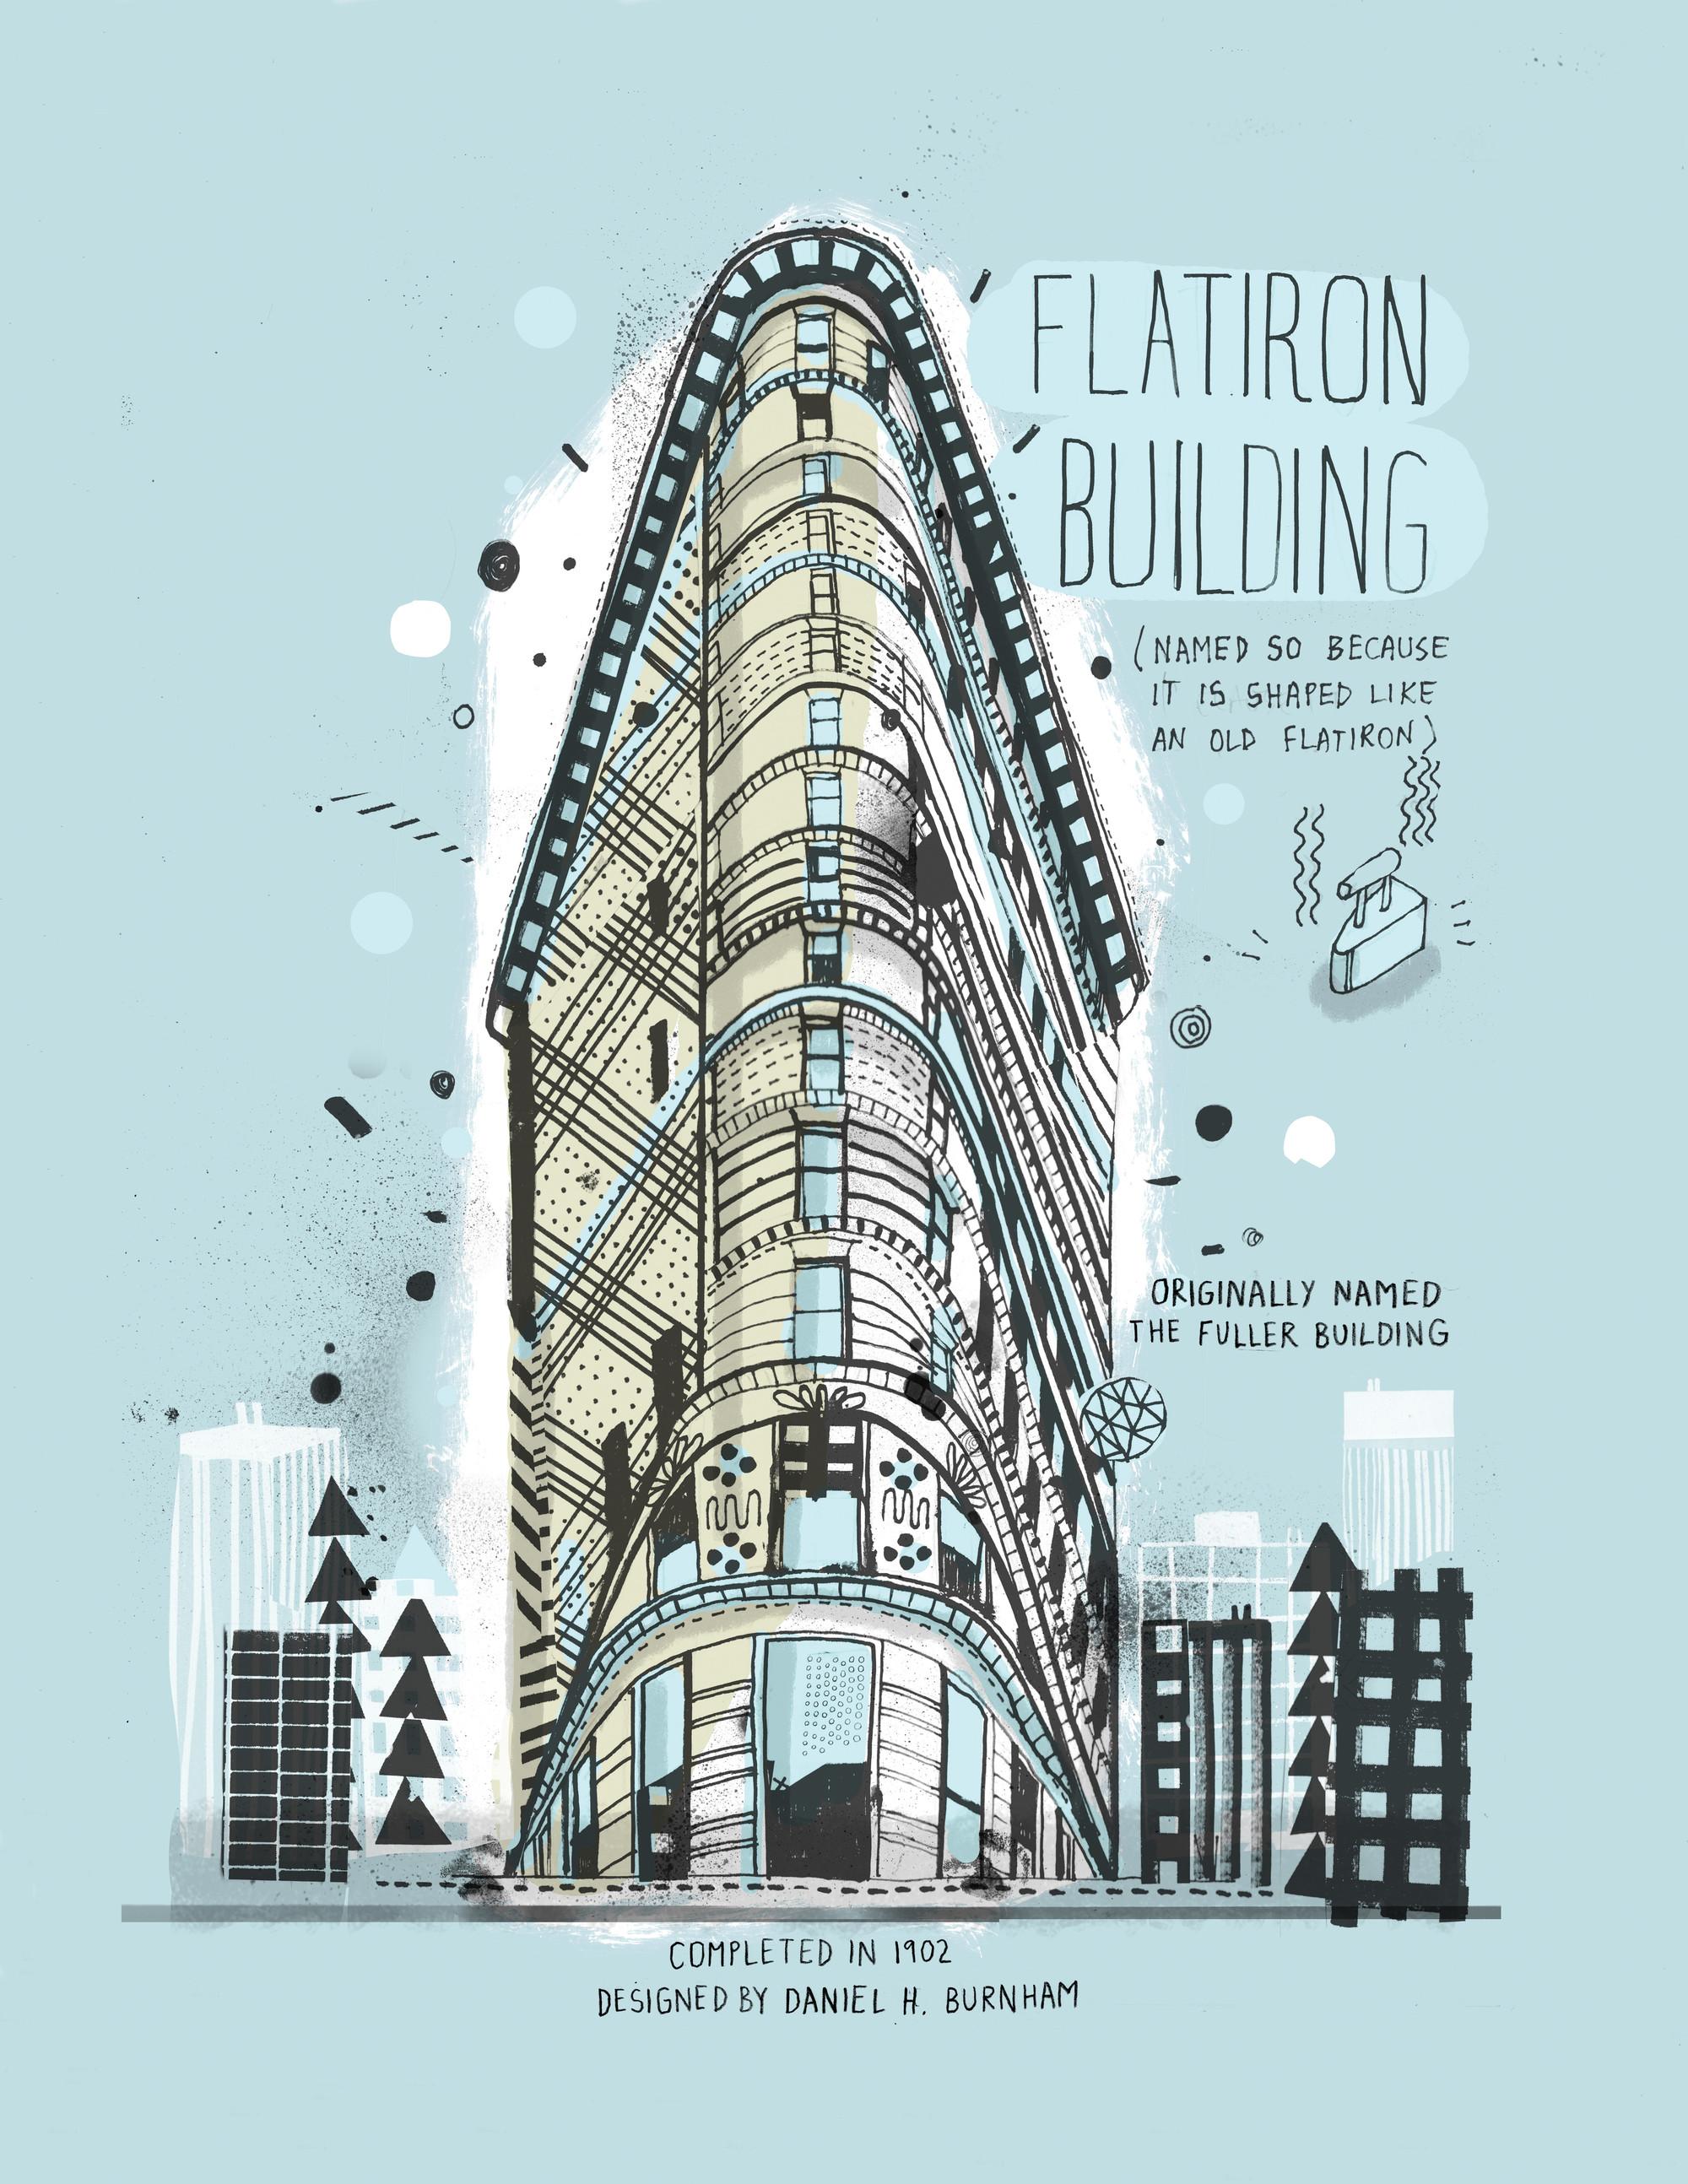 Drawn scenic architecture city Courtesy New Hand in York